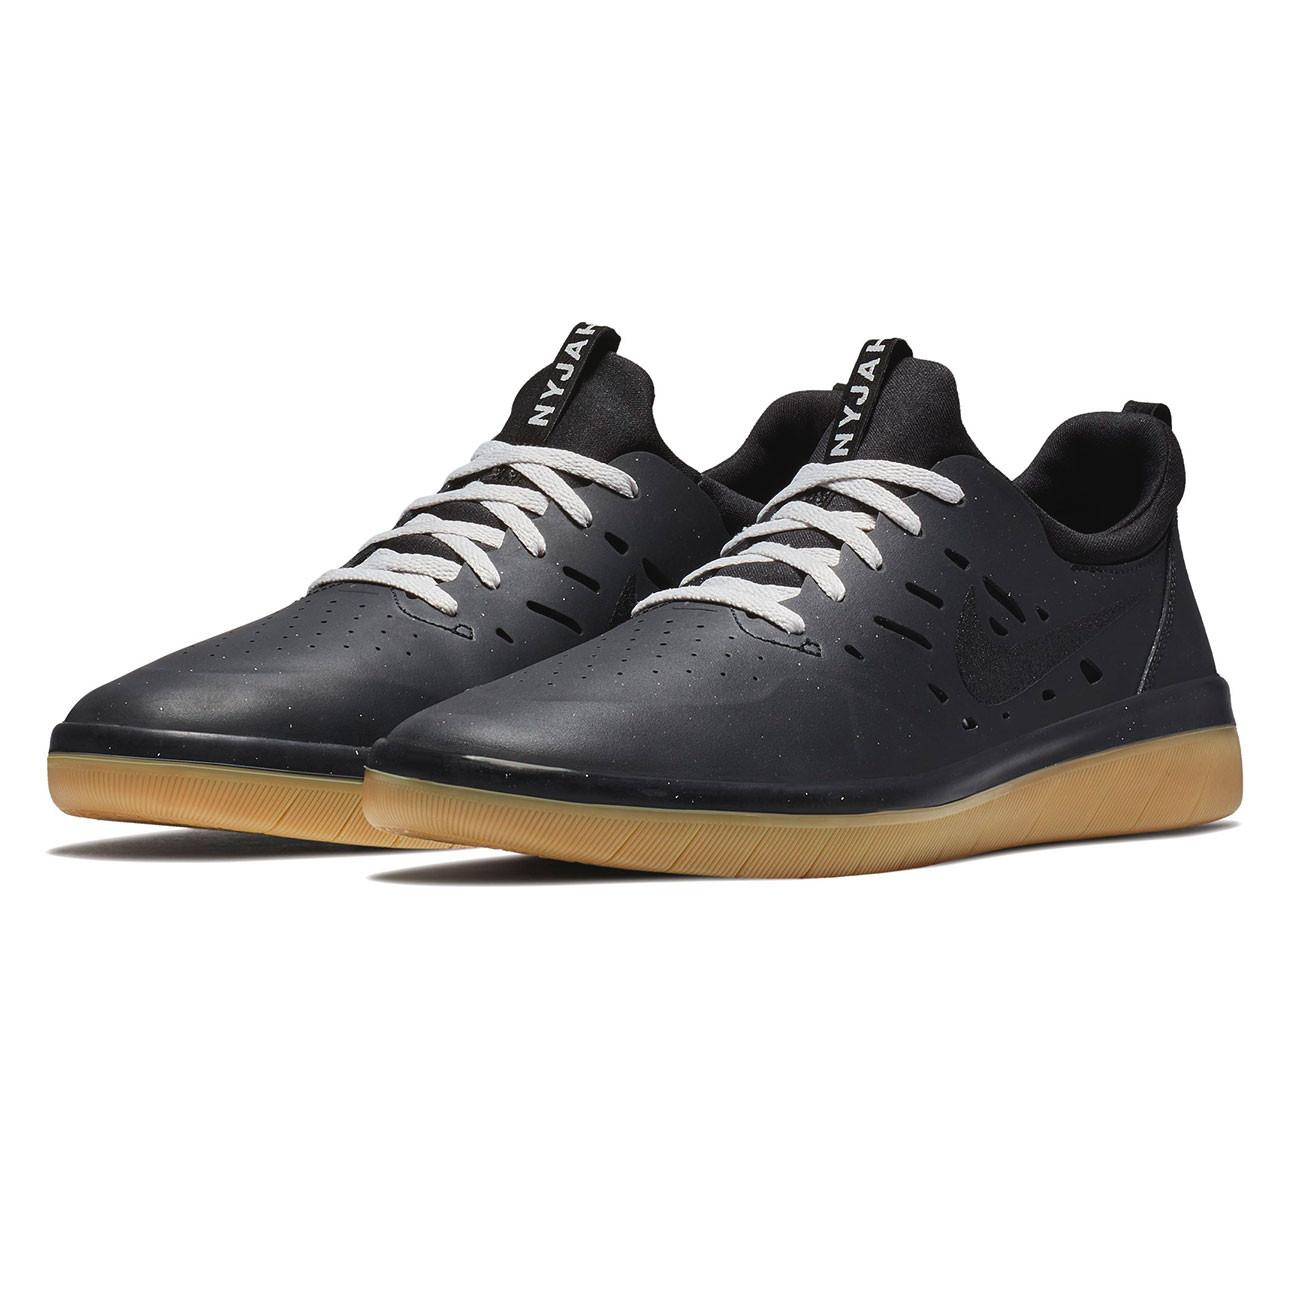 b07aff316507 Sneakers Nike SB Nyjah Free black black-gum light brown